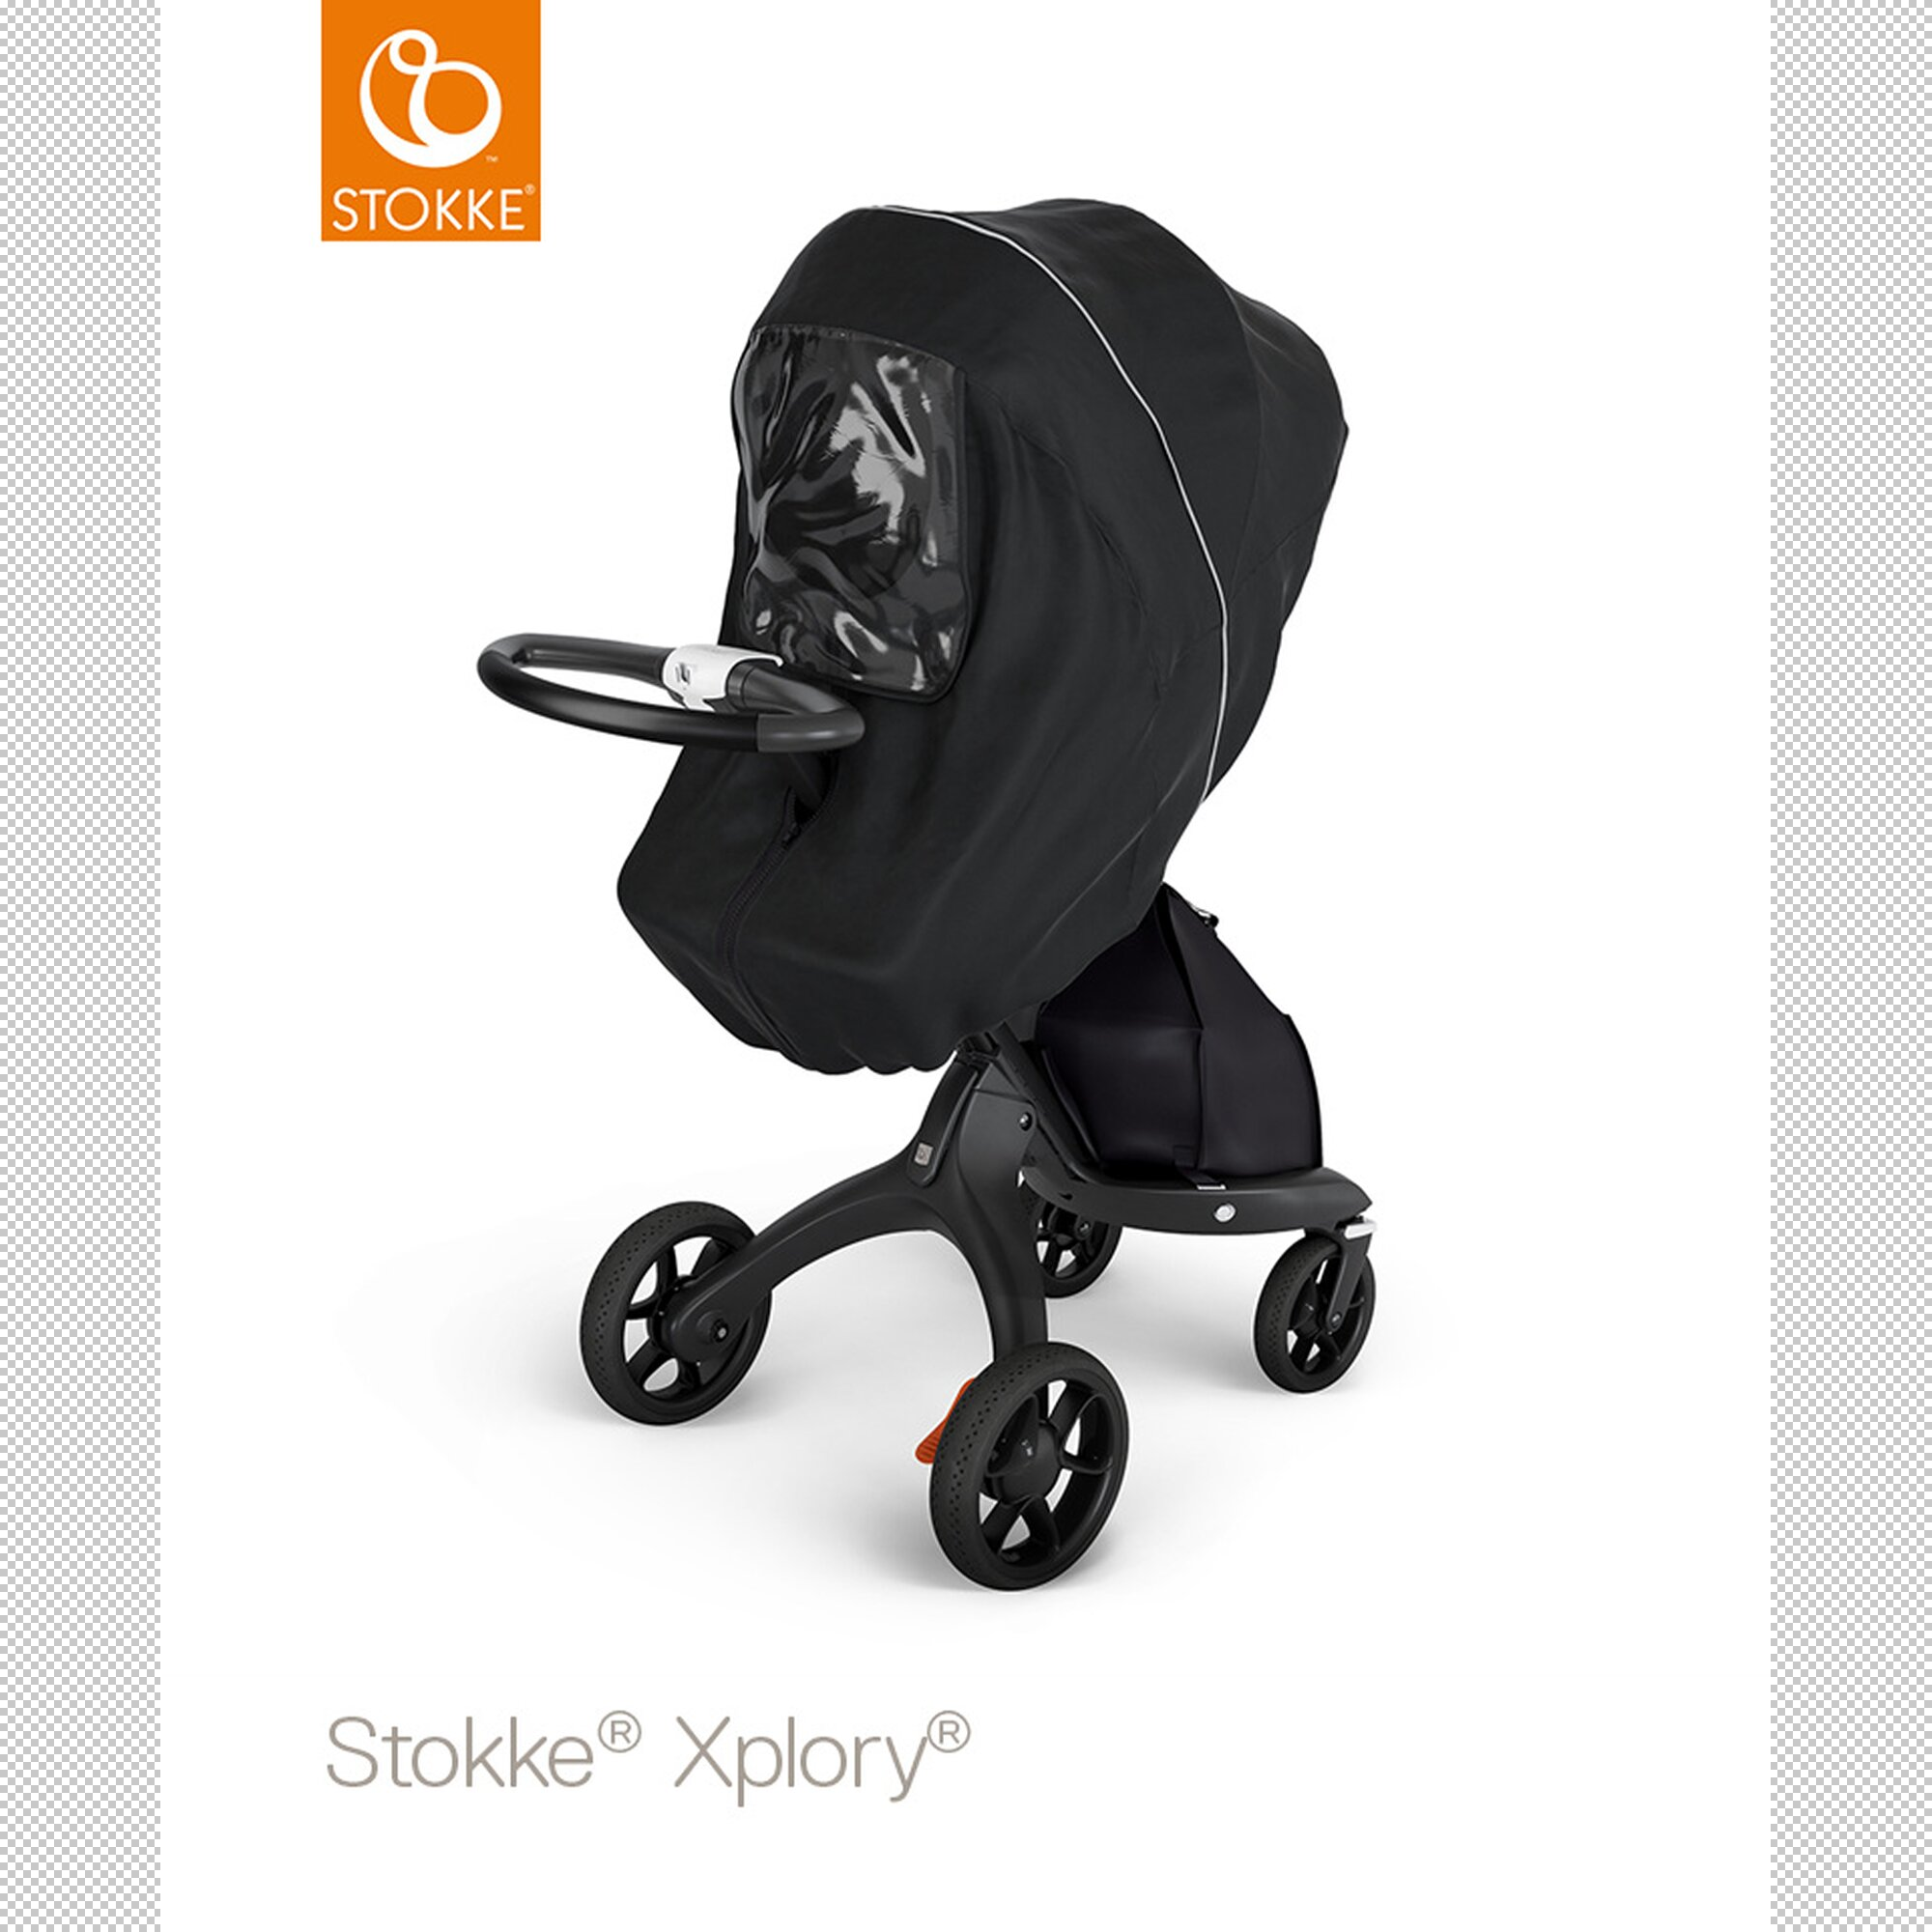 stokke-regenschutz-fur-xplory-v6-trailz-transparent